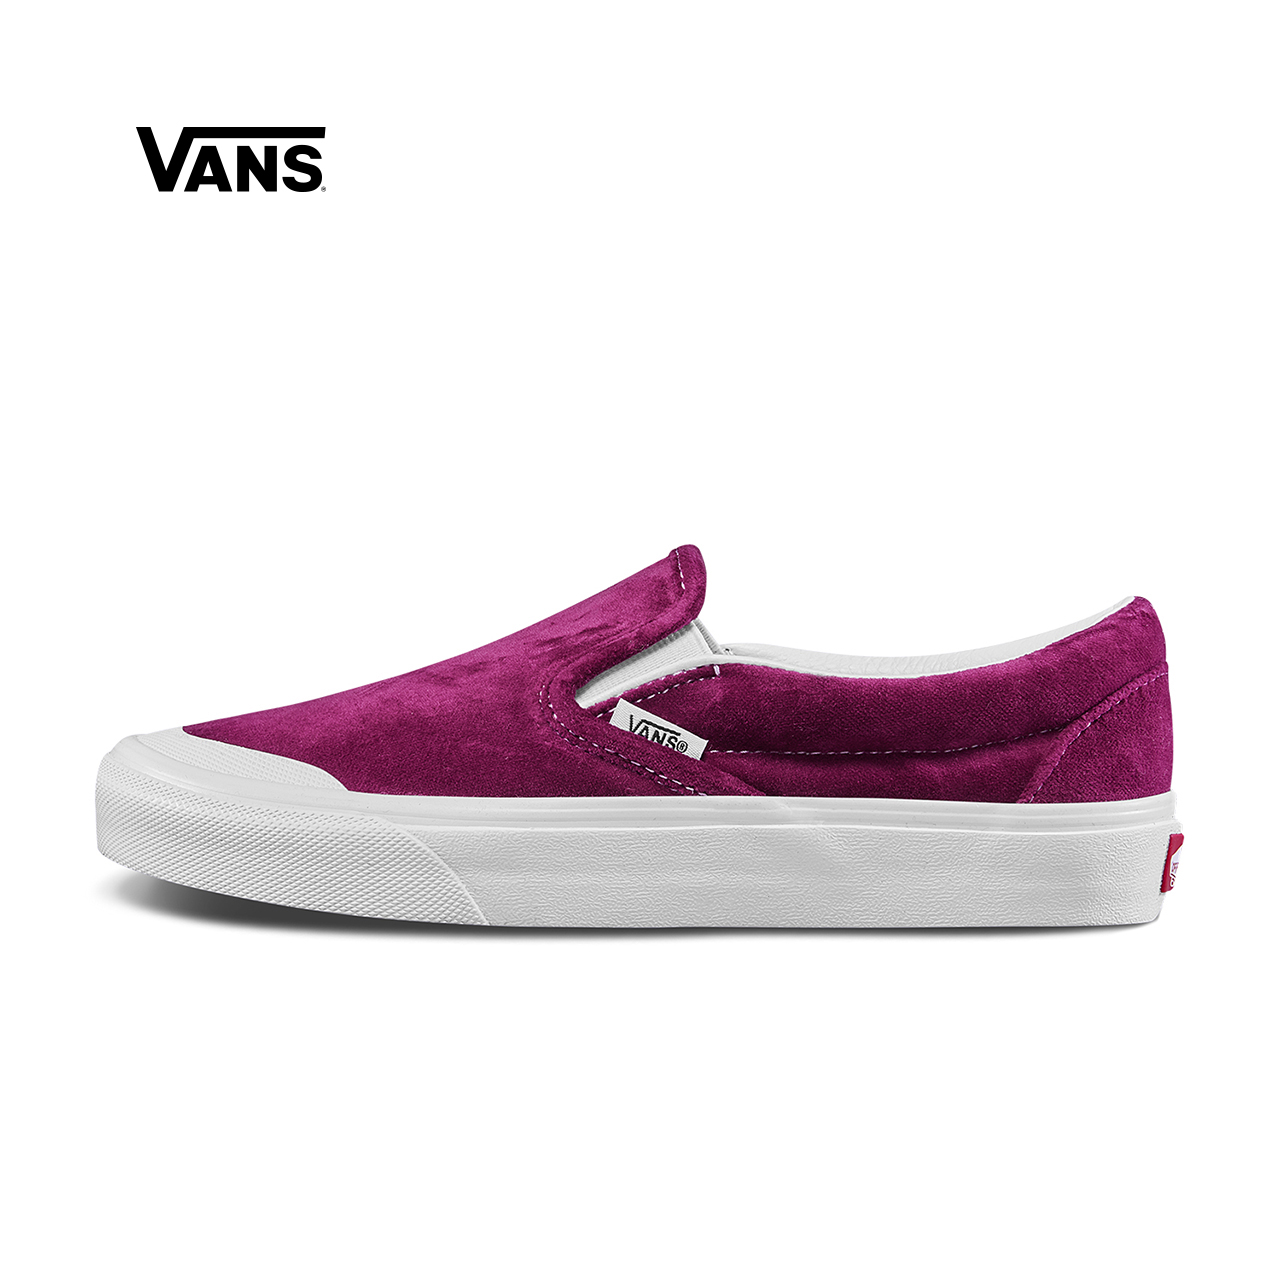 Vans范斯 经典系列 Slip-On帆布鞋 低帮女子丝绒新款官方正品